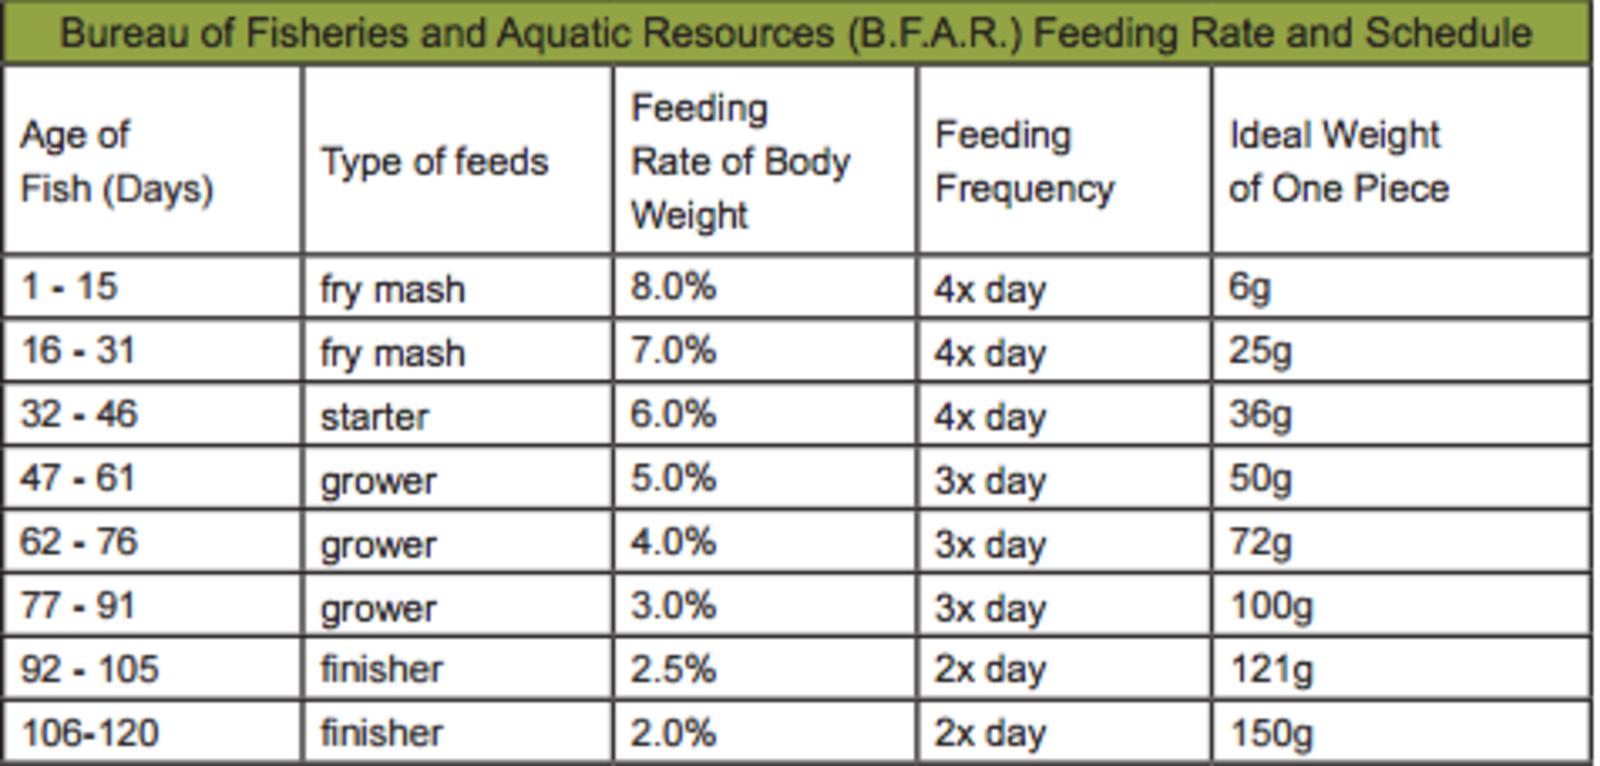 Farm feed fish chart2 for Fish feeding chart